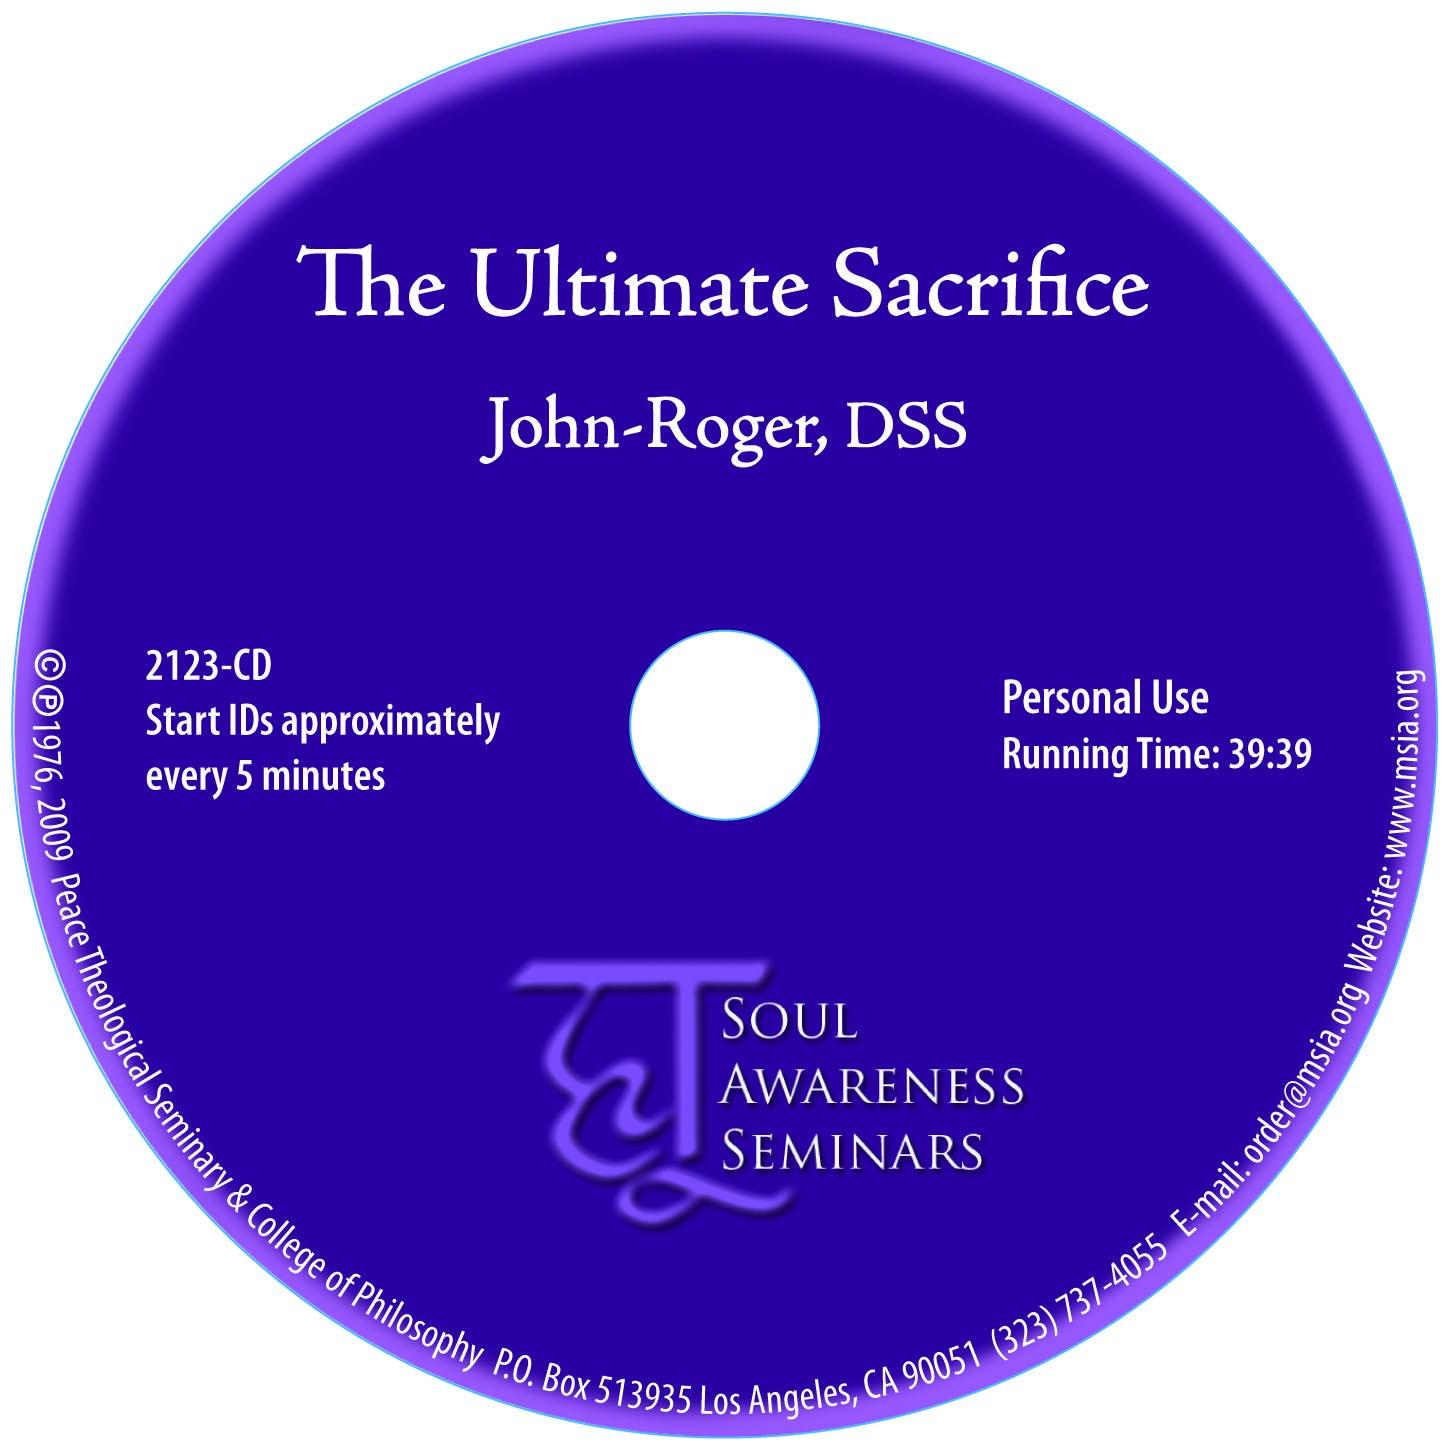 The Ultimate Sacrifice MP3